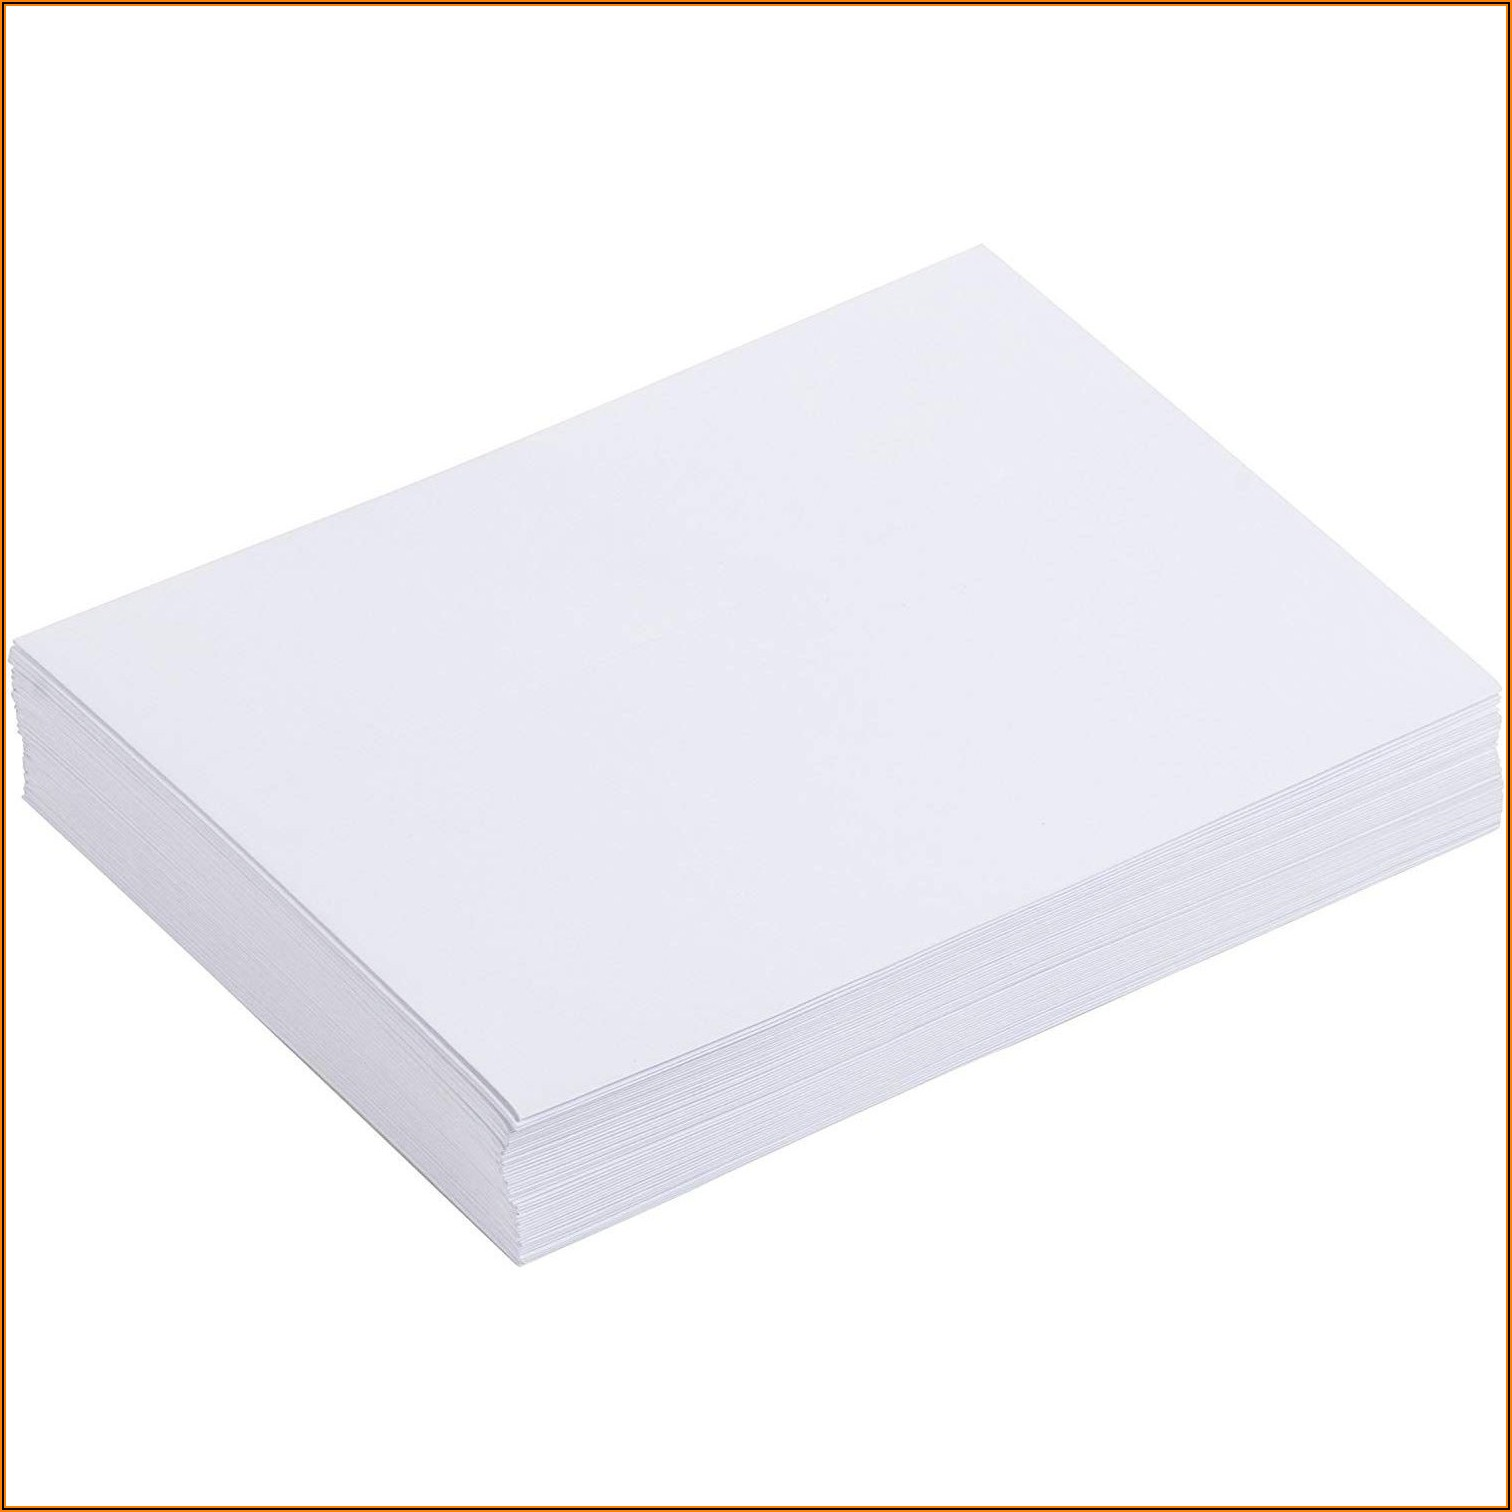 Foil Lined Envelopes 5x7